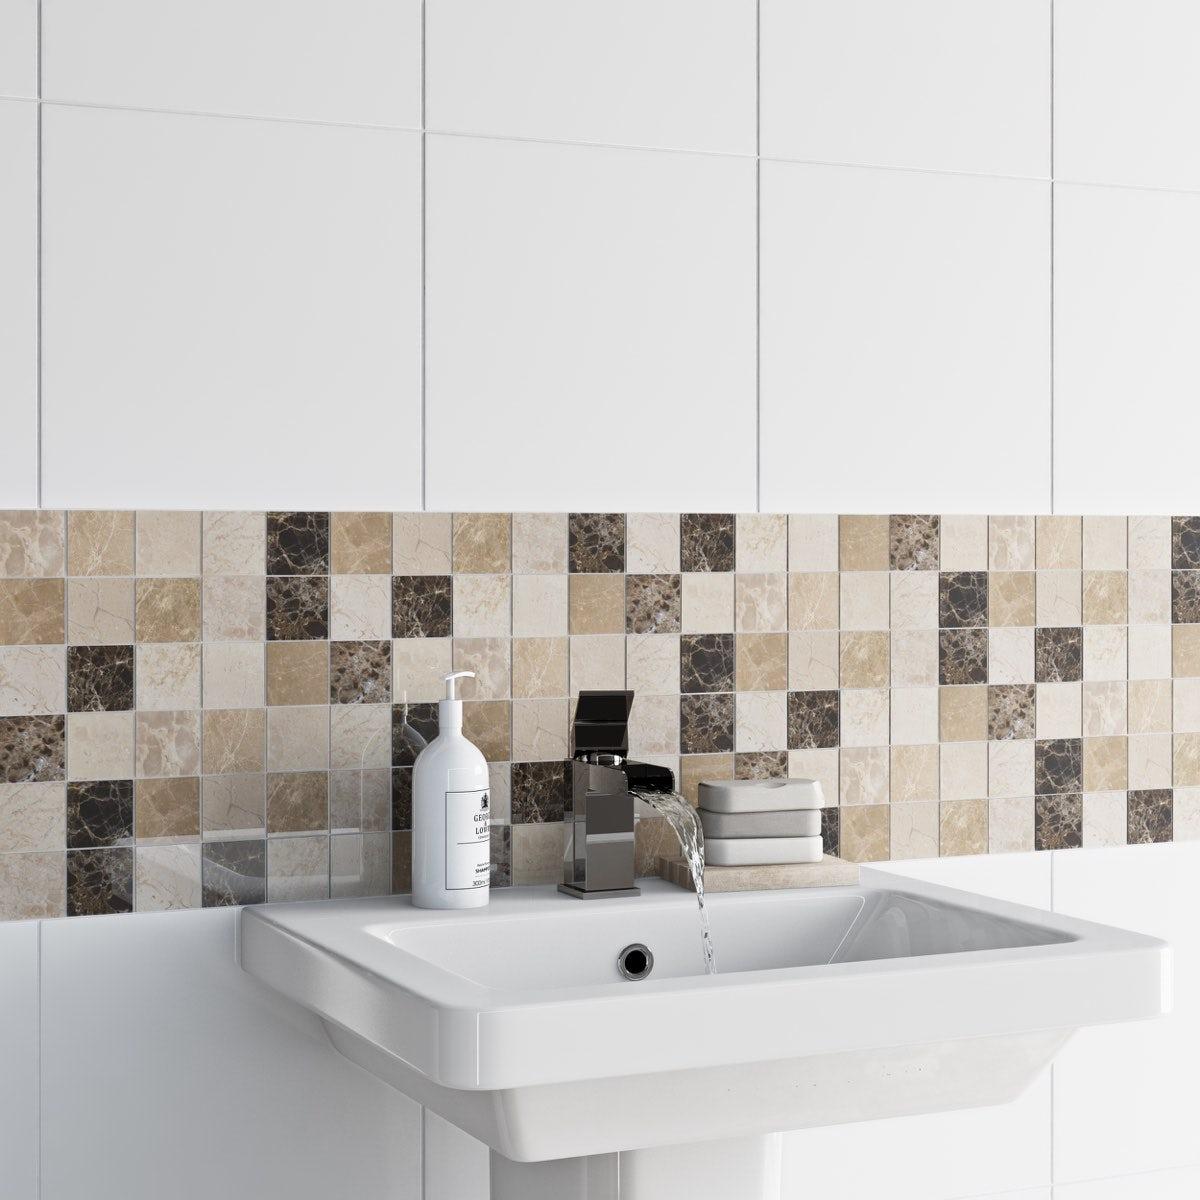 British ceramic tile mosaic rock beige gloss tile 305mm x 305mm british ceramic tile mosaic rock beige gloss tile 305mm x 305mm 1 sheet dailygadgetfo Images